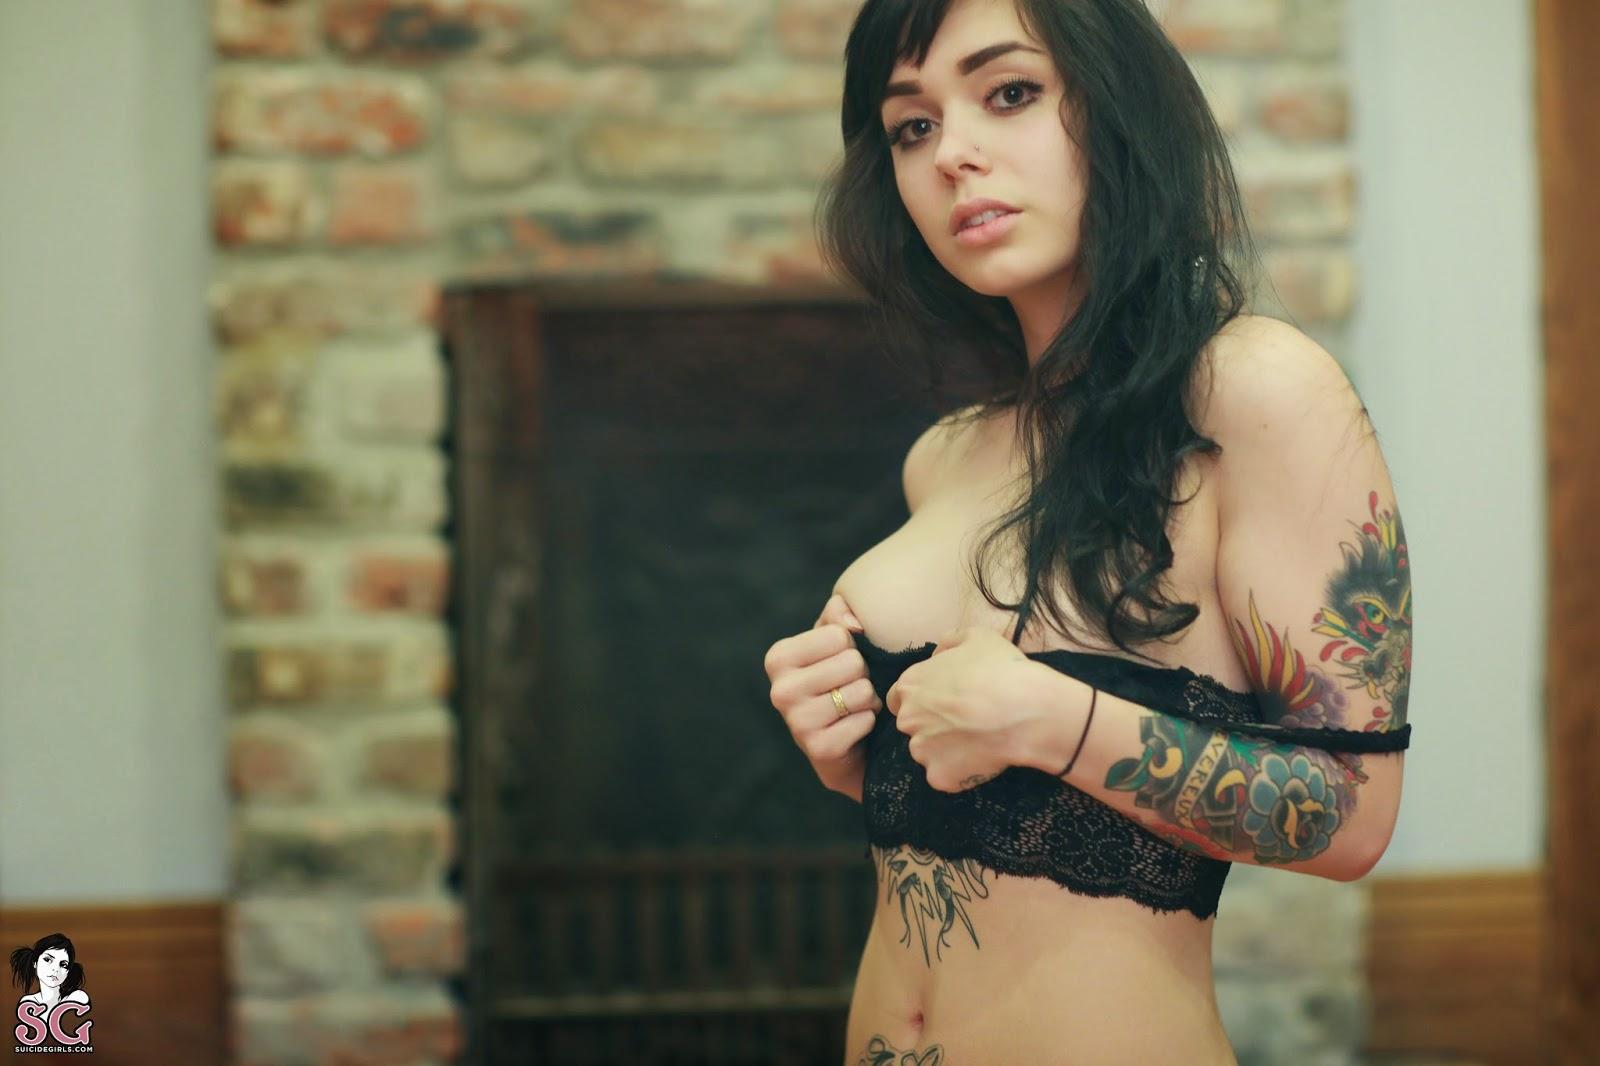 Anna-lee jackson naked